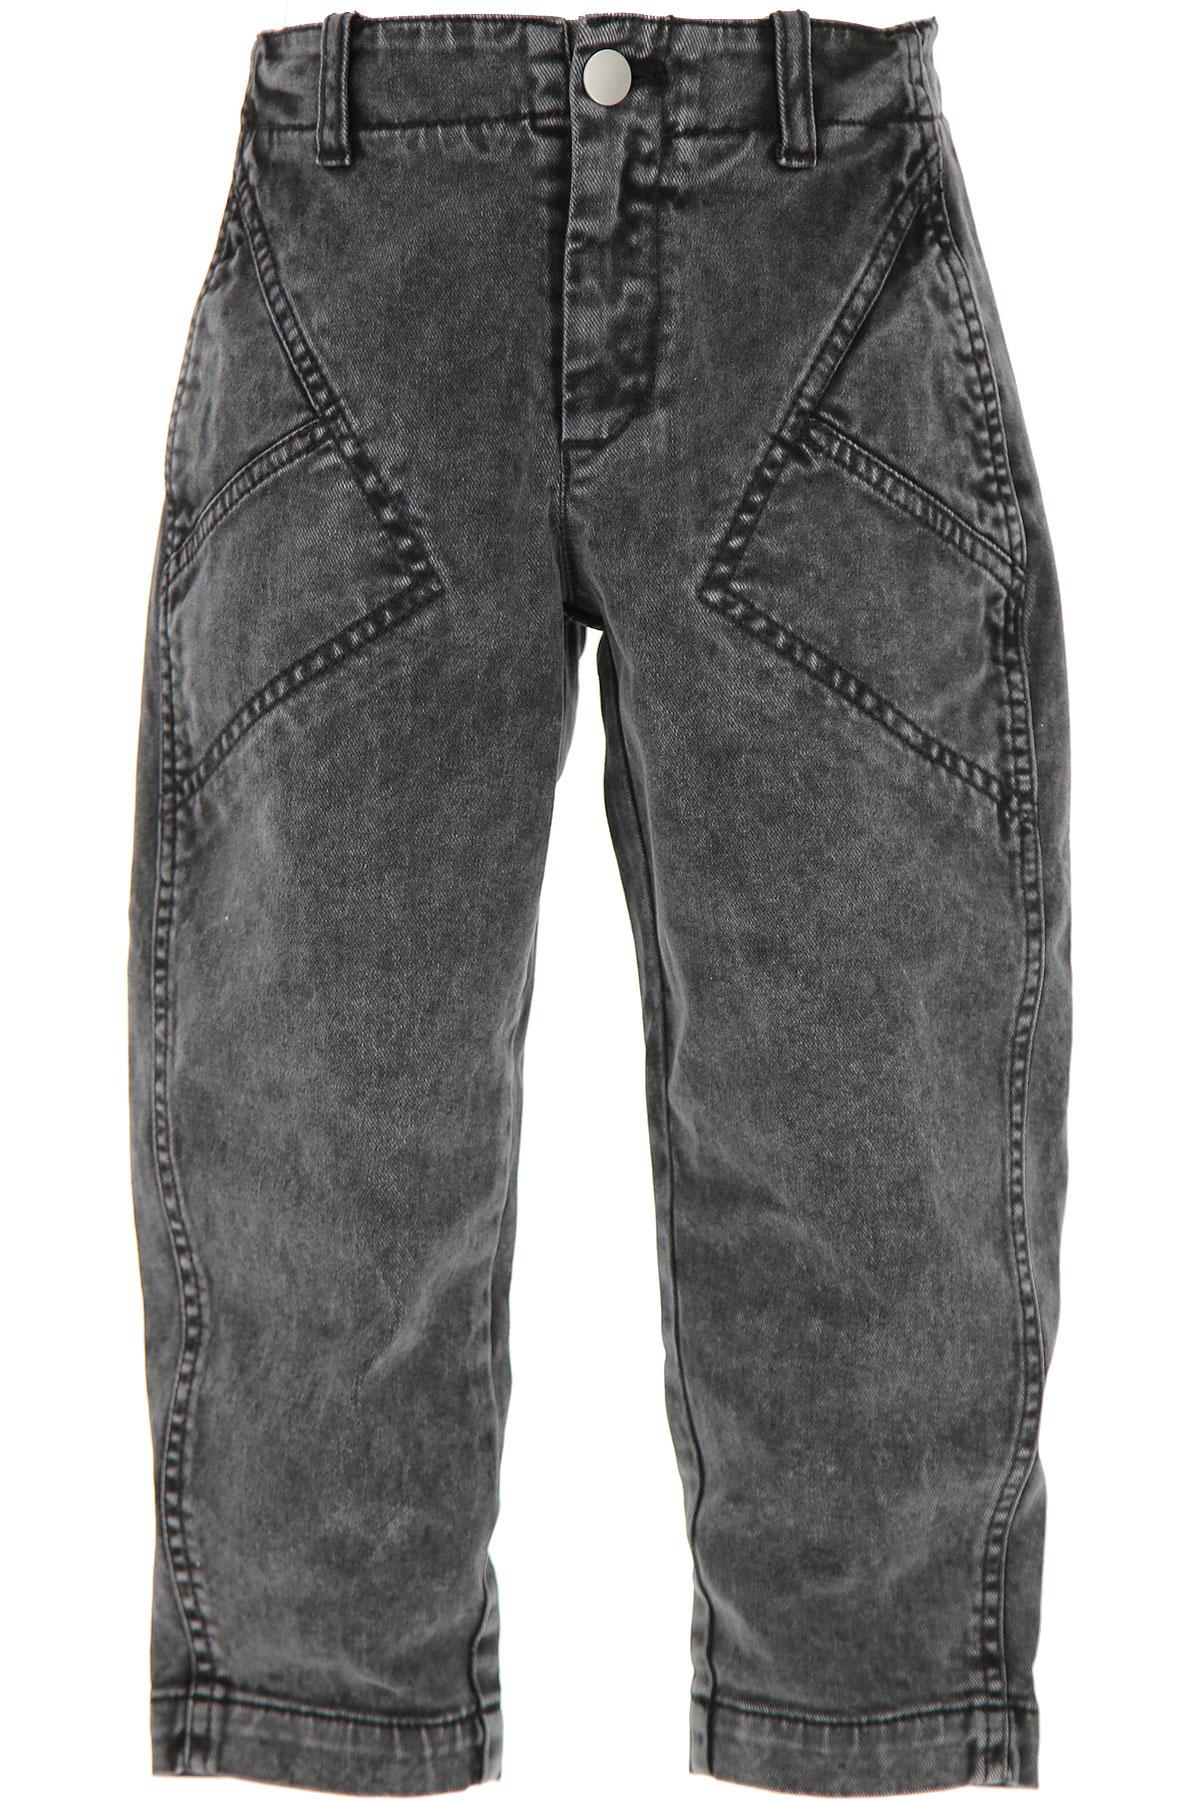 Philosophy di Lorenzo Serafini Kids Jeans for Girls On Sale, Dark Grey, Cotton, 2019, 6Y 8Y